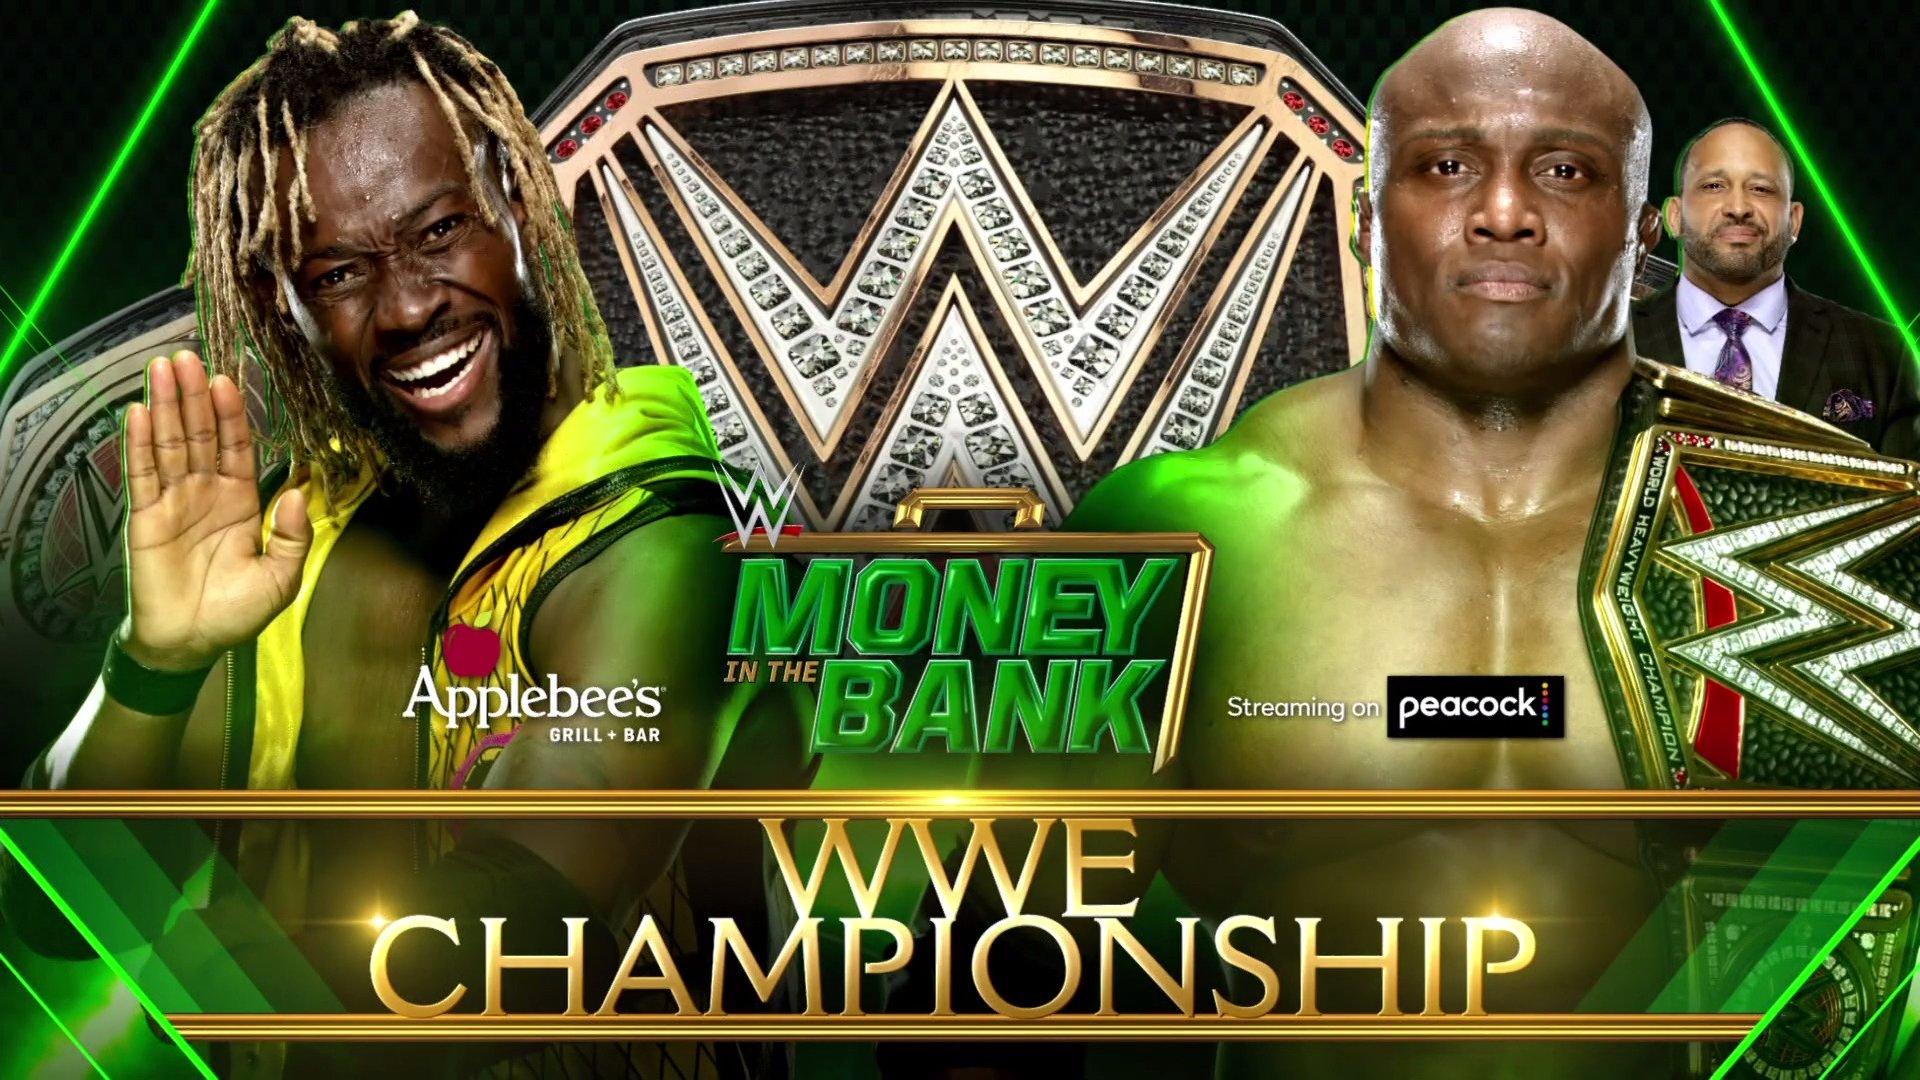 Kofi Kingston disputará o WWE Championship no Money in the Bank